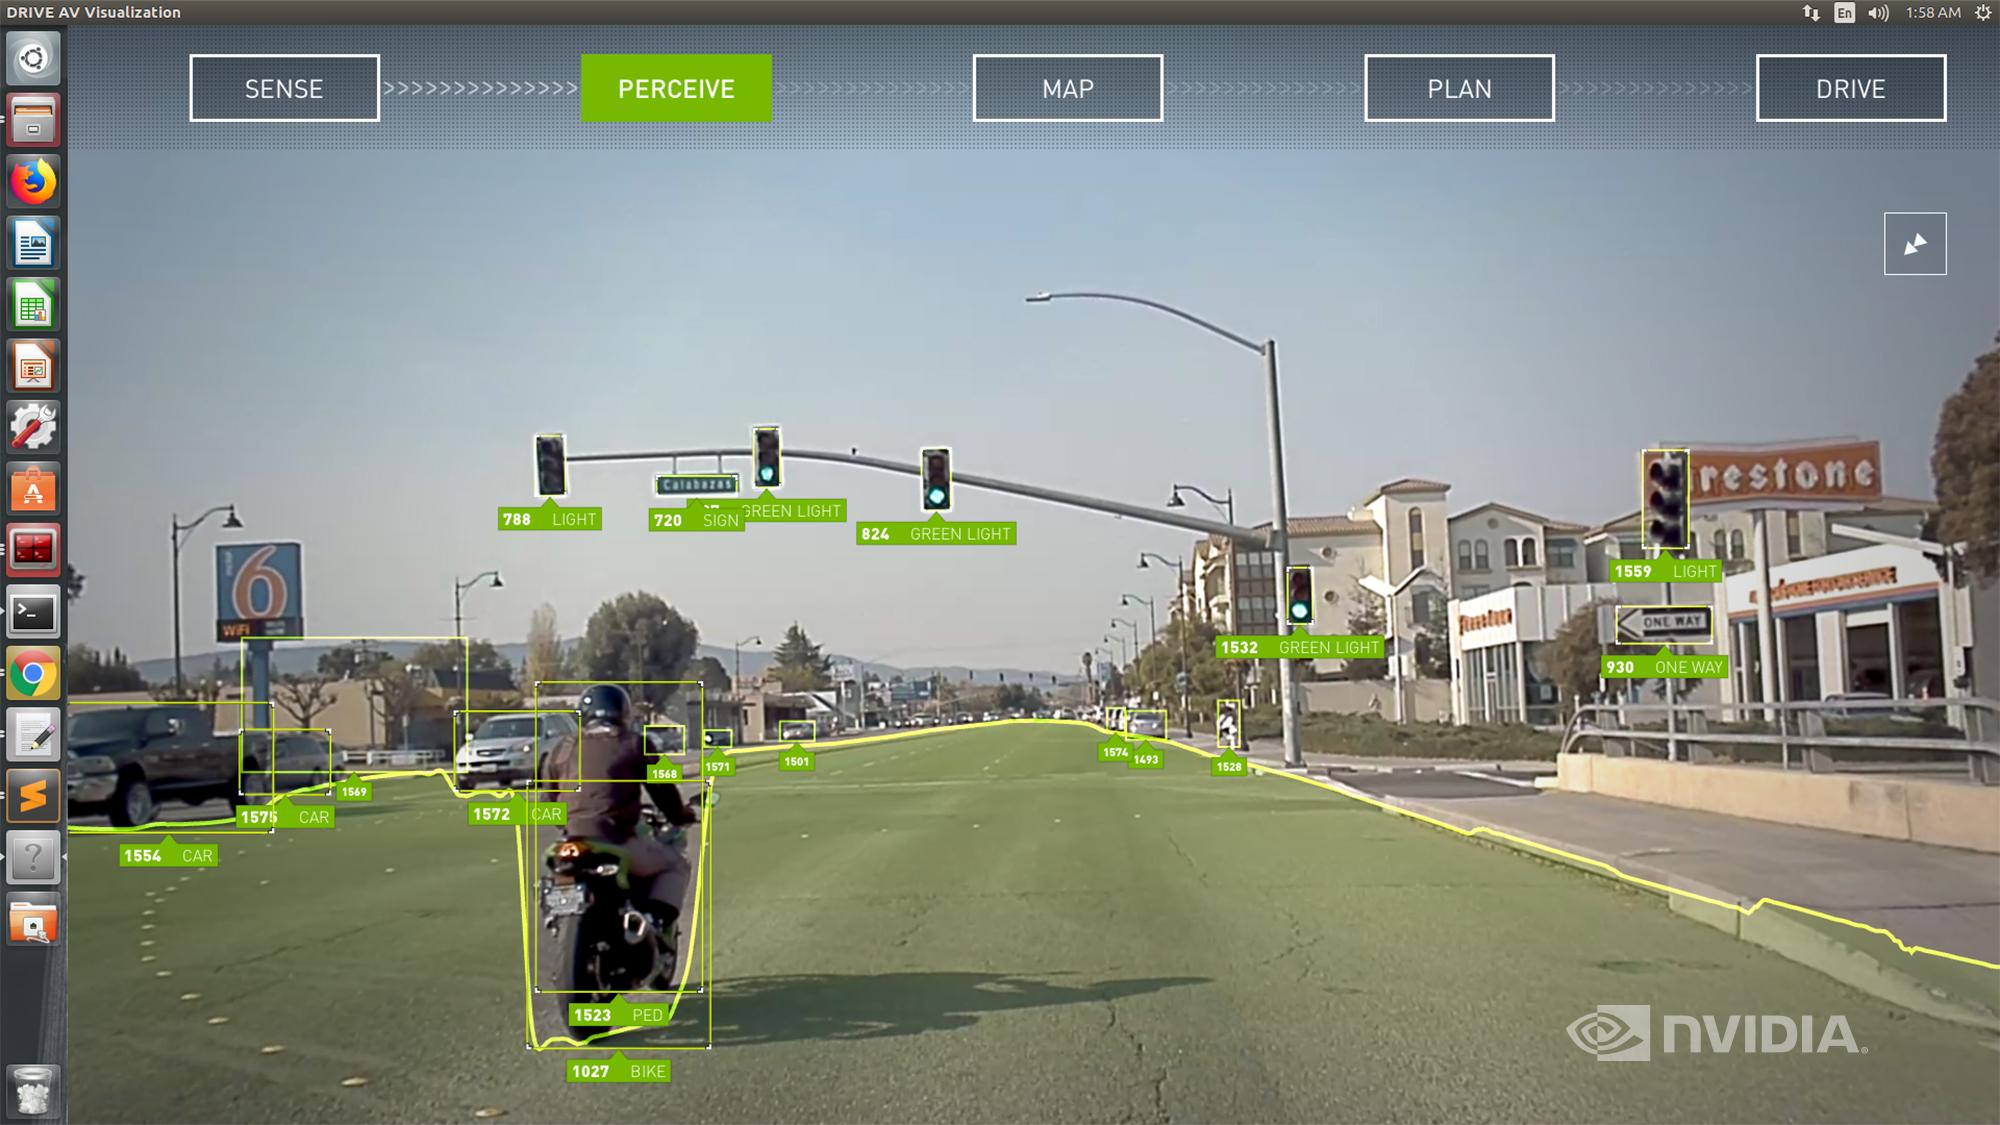 nvidia drive software 8 NVIDIA ประกาศเปิดตัวระบบขับขี่อัตโนมัติที่ควบคุมได้ดียิ่งขึ้นในระดับที่2 Level2+ ซึ่งเป็นระบบแรกของโลกที่ใช้ระบบ NVIDIA DRIVE AutoPilot ซึ่งรวมเทคโนโลยี AI ที่ล้ำสมัยหลายอย่างเข้าด้วยกันพร้อมใช้งานปีหน้า 2020